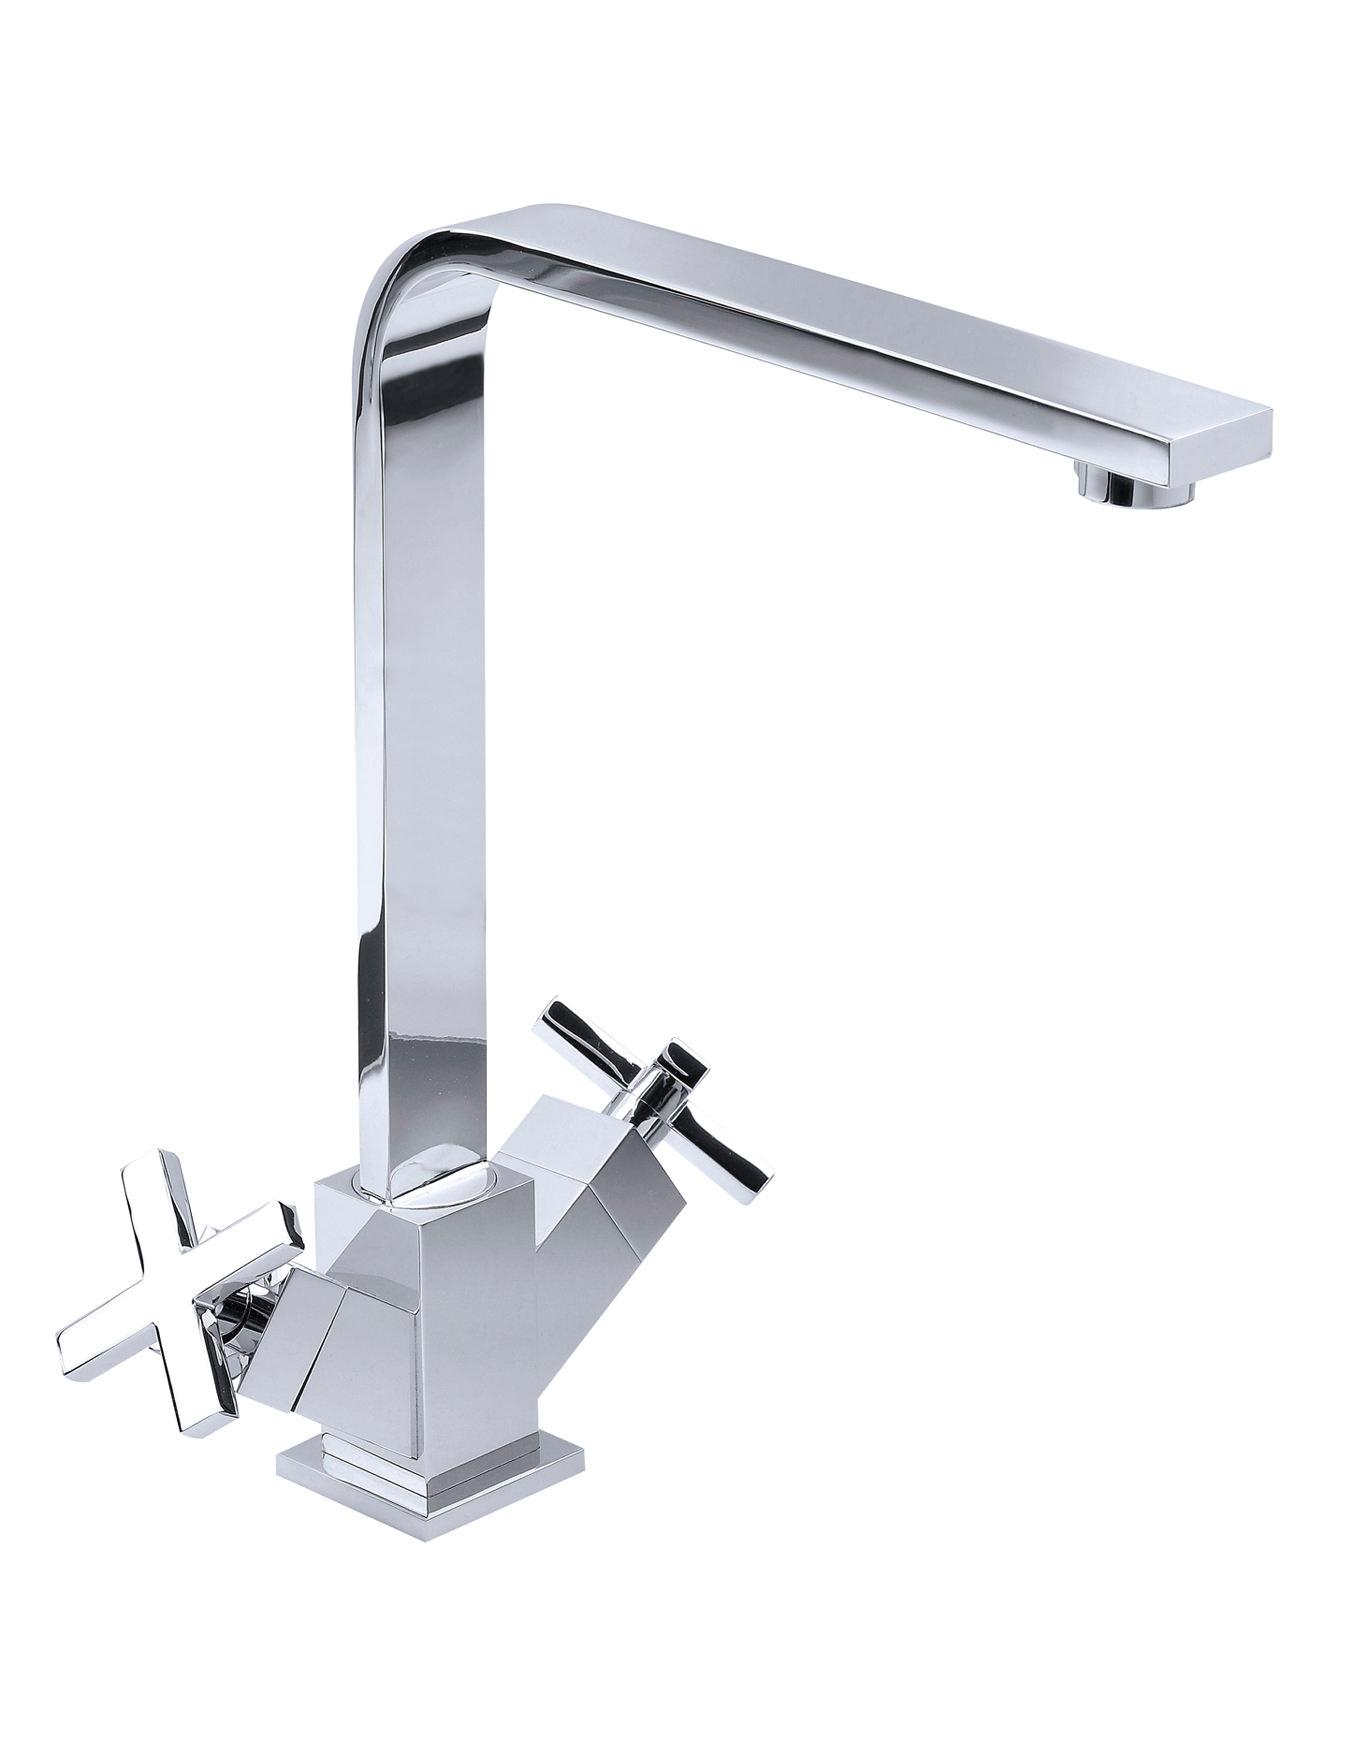 Mayfair Iggy Kitchen Sink Mixer Tap Chrome